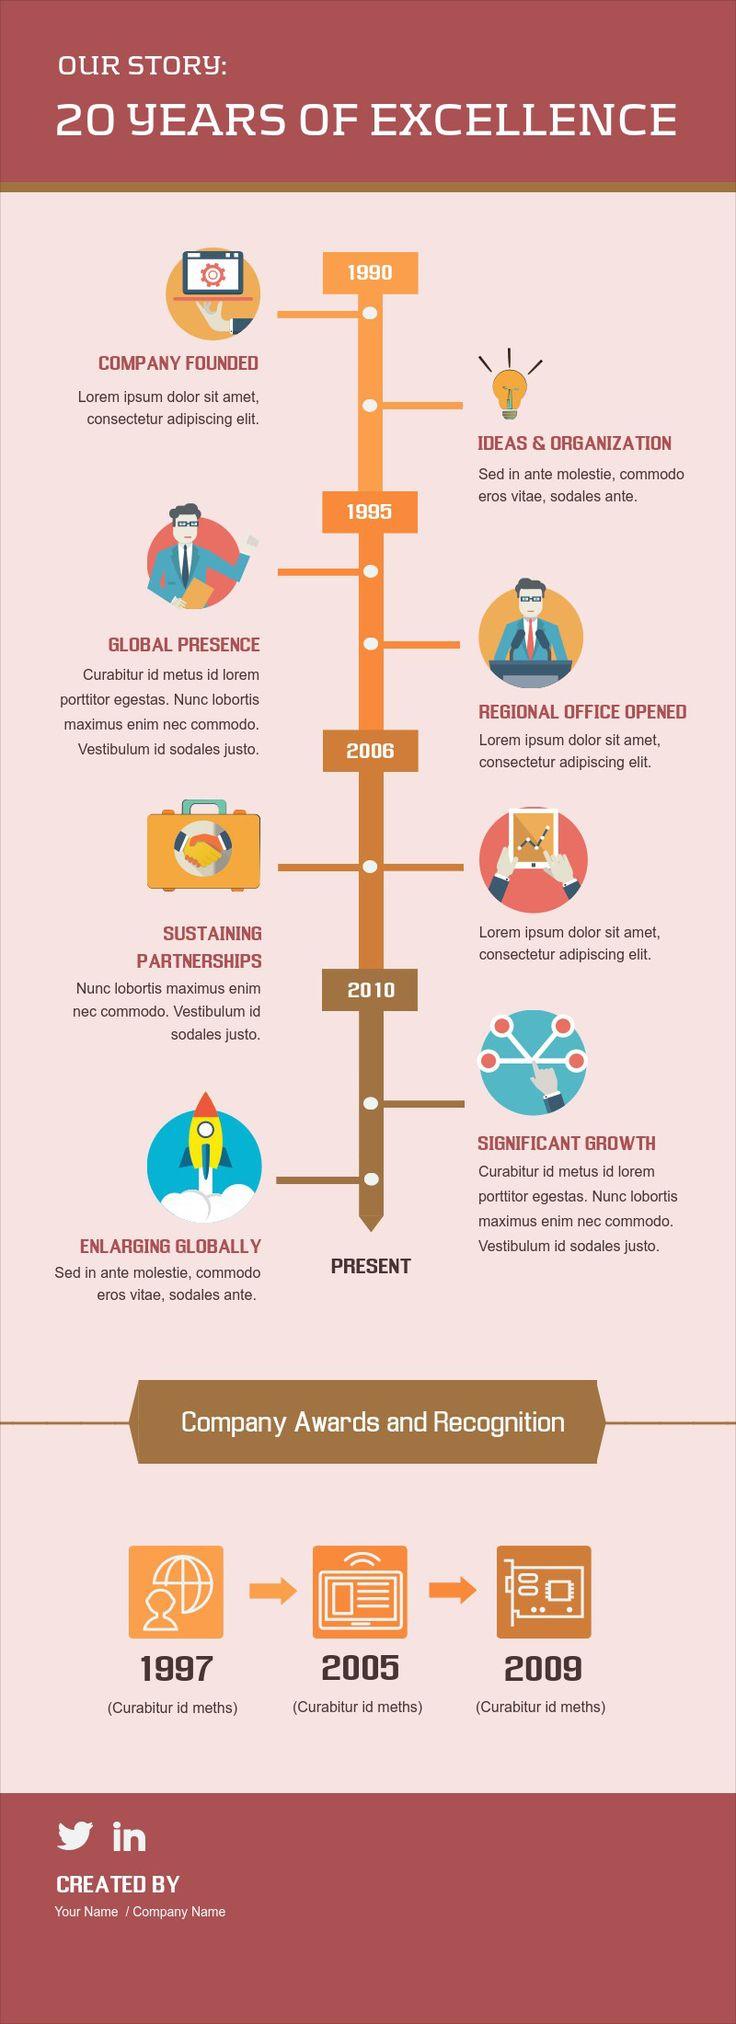 Infographic-Infographic-Design-Visme-Introduces-New-Infographic-Timeline-Templates Infographic : Infographic Design: Visme Introduces New Infographic Timeline Templates